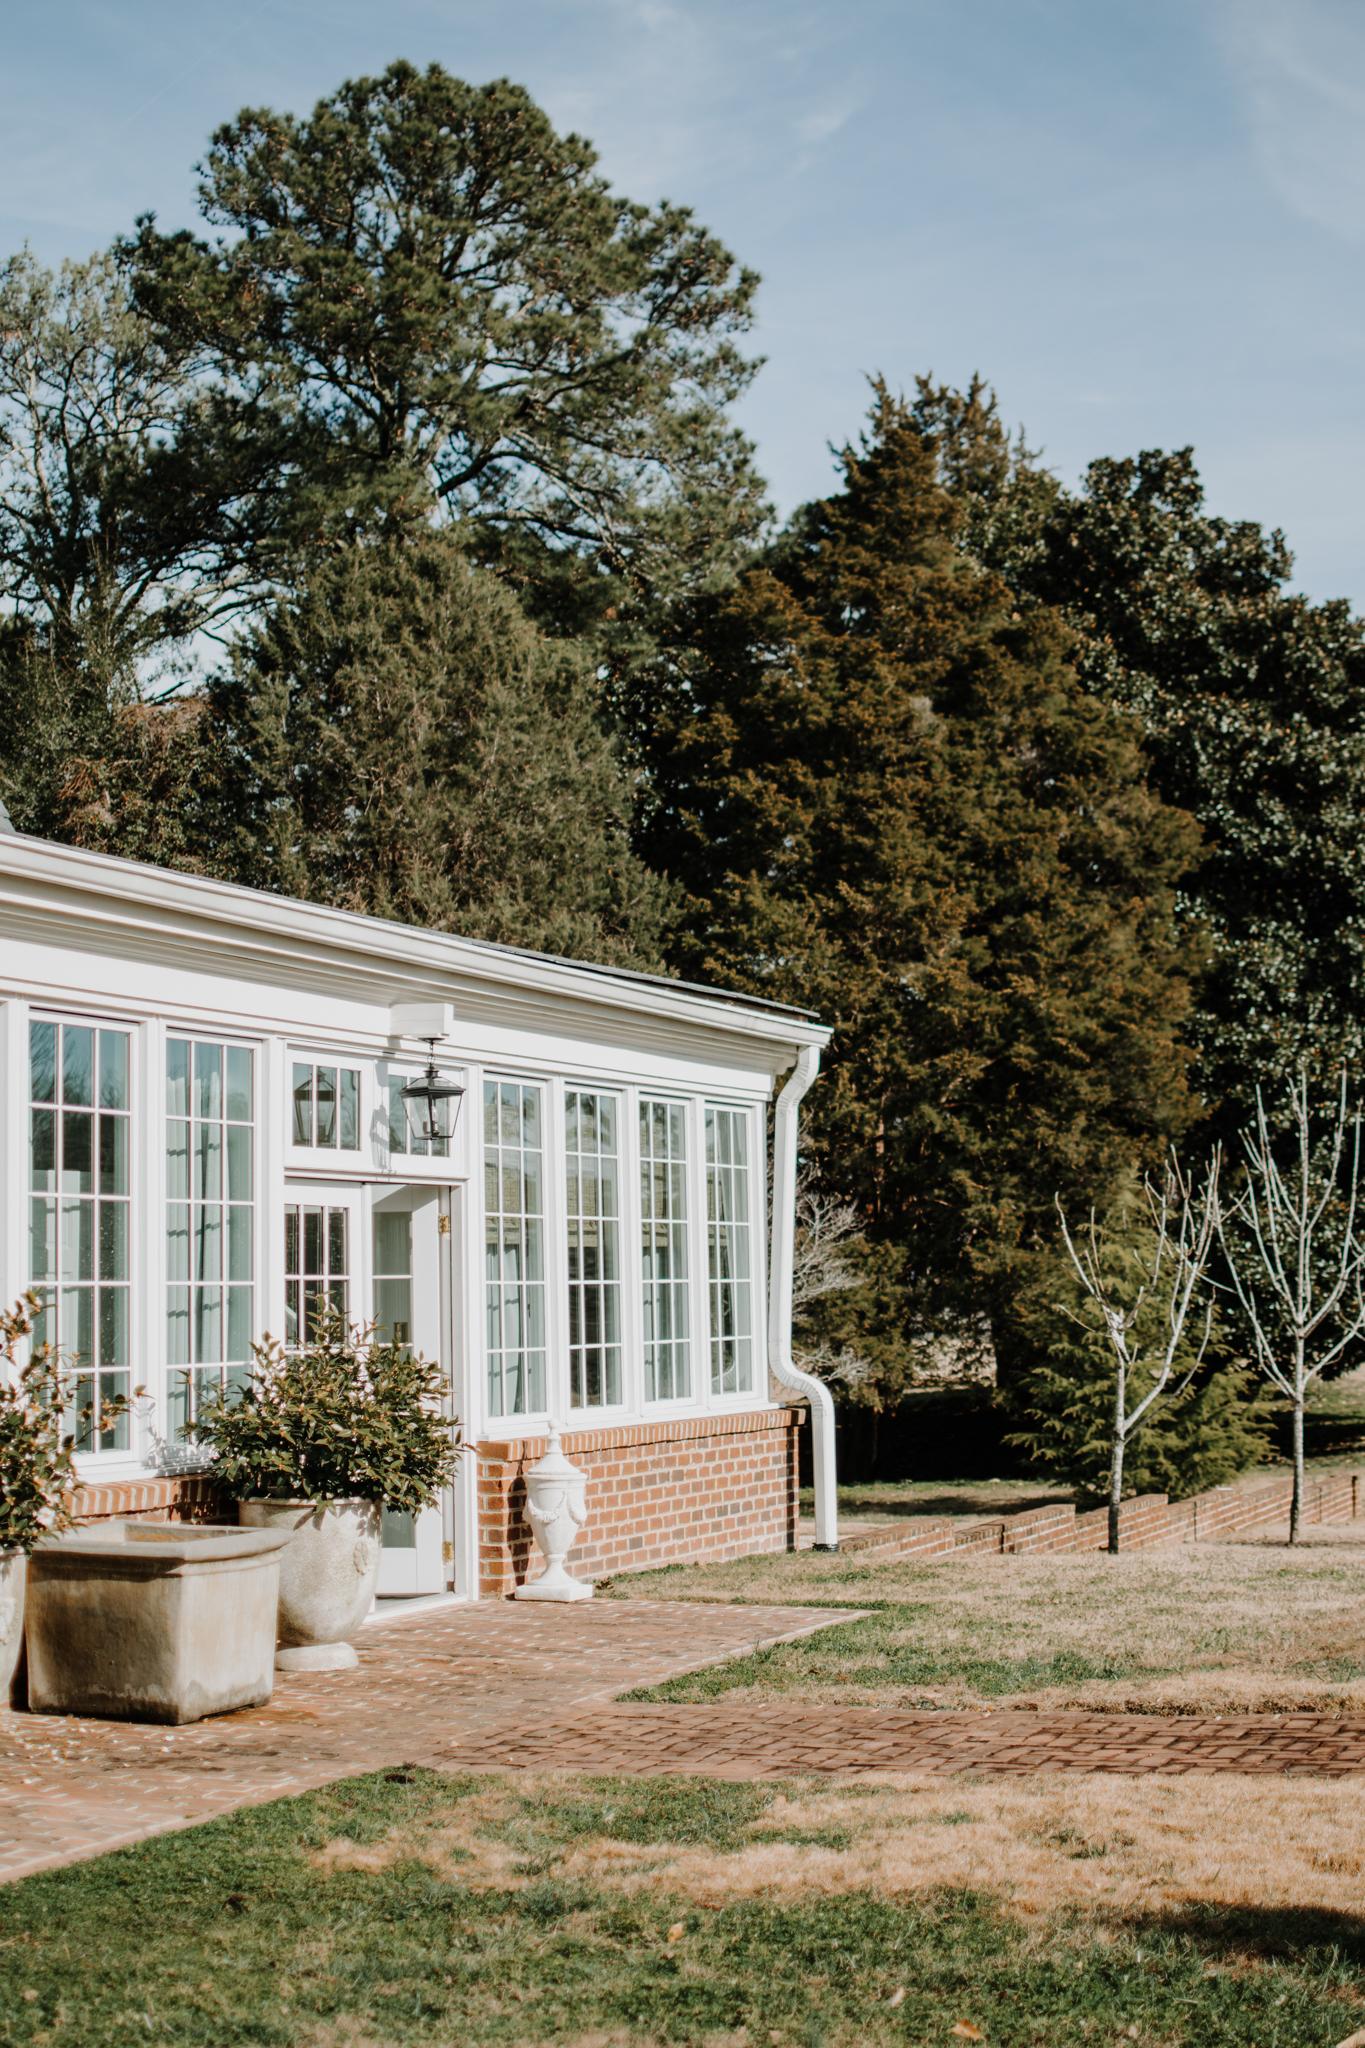 quick getaway - cumberland estate new kent county